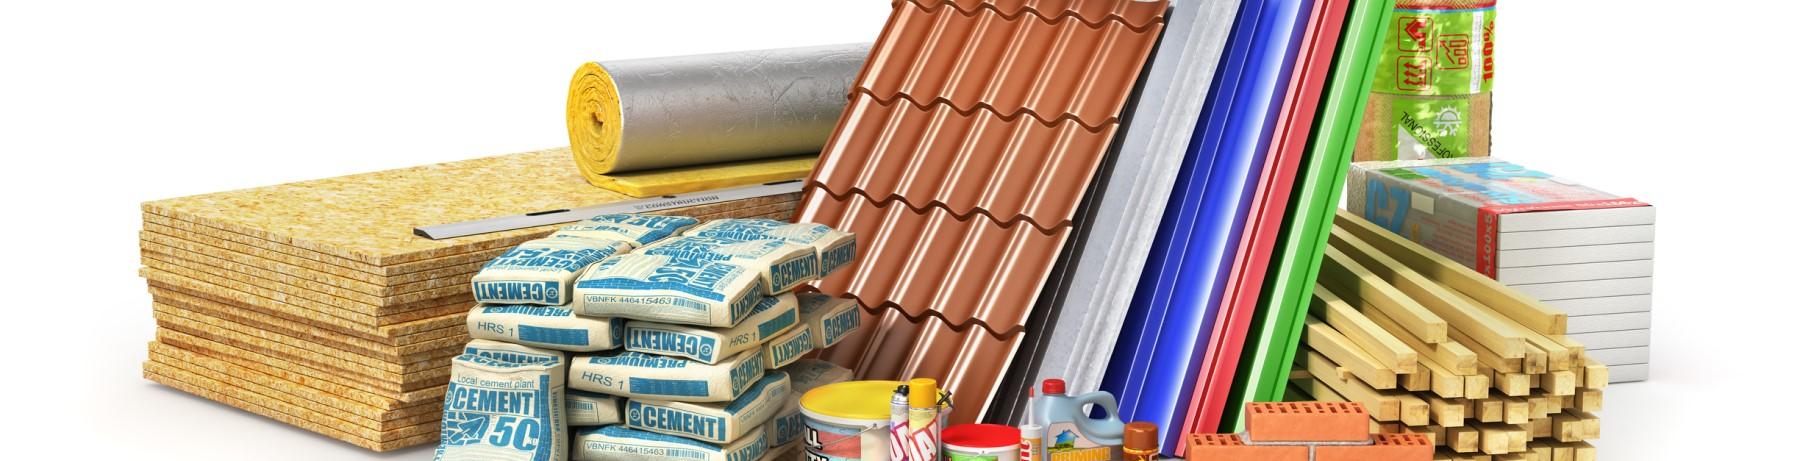 Engpässe bei Baumaterialien erfordern erhöhte Baustellen-Security